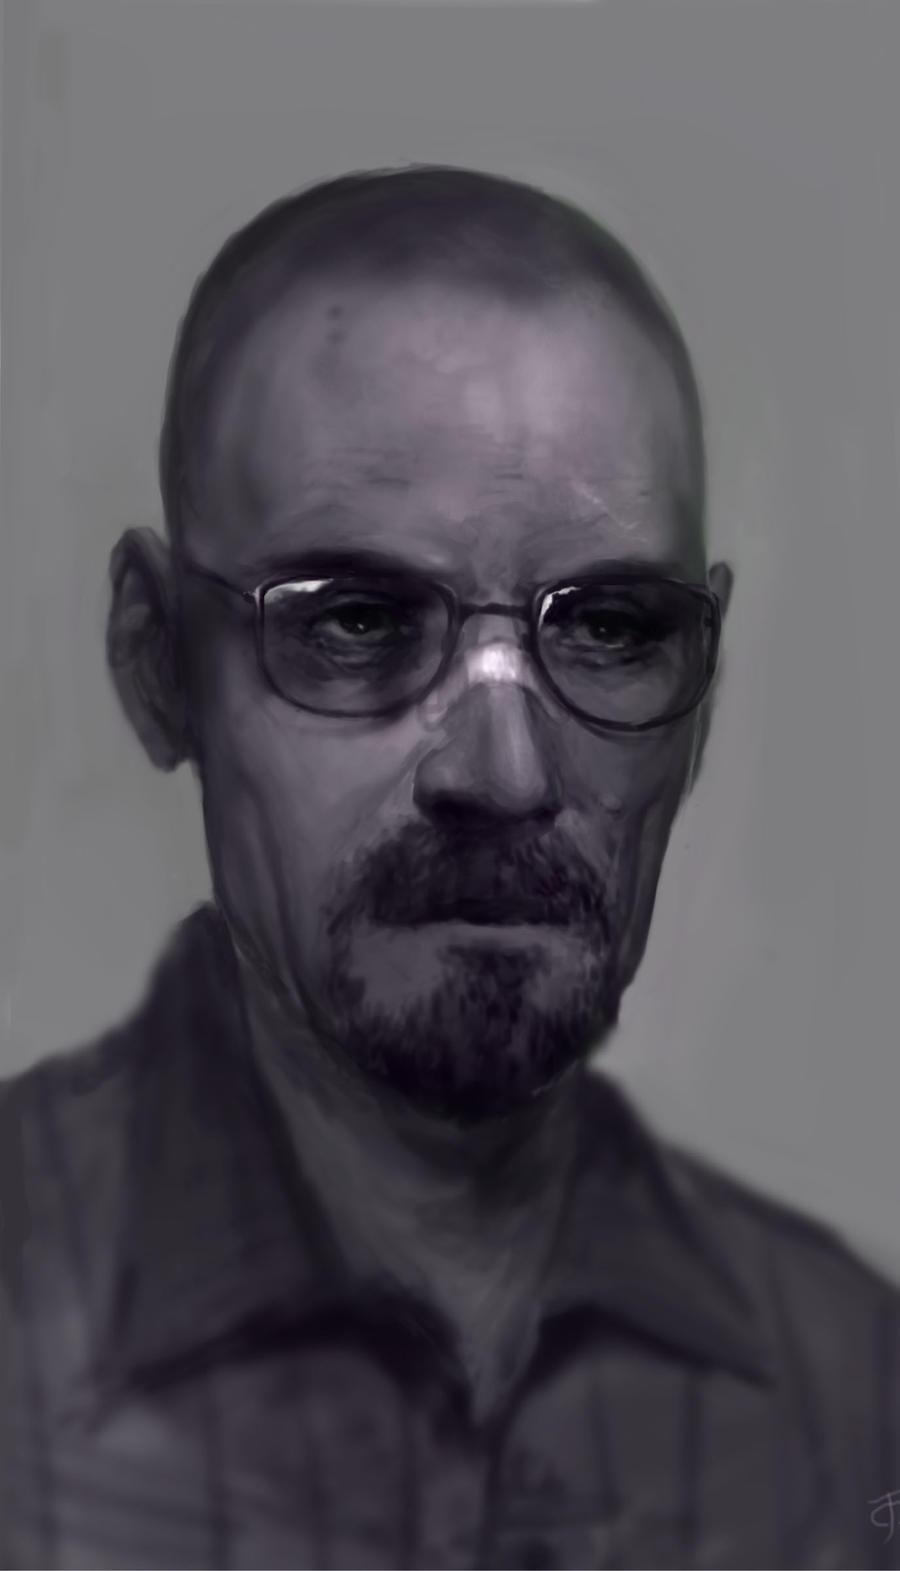 Heisenberg by ChrisJRees